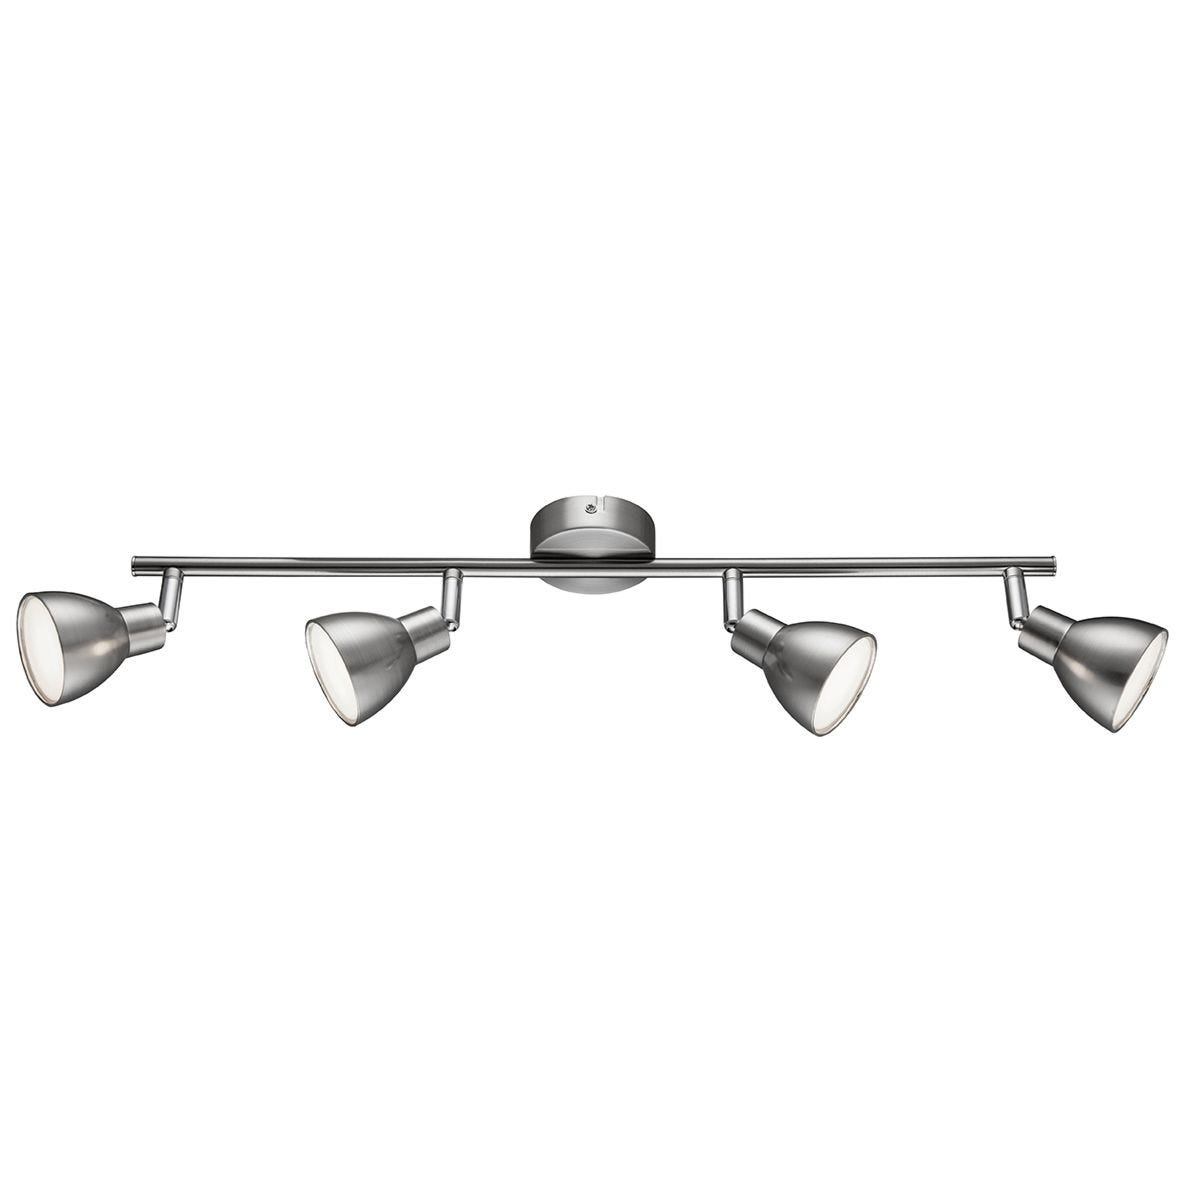 Action Lester Pendant Bar/Spot Light - Nickel Matt Finished/Chrome with 4 x LED Bulbs